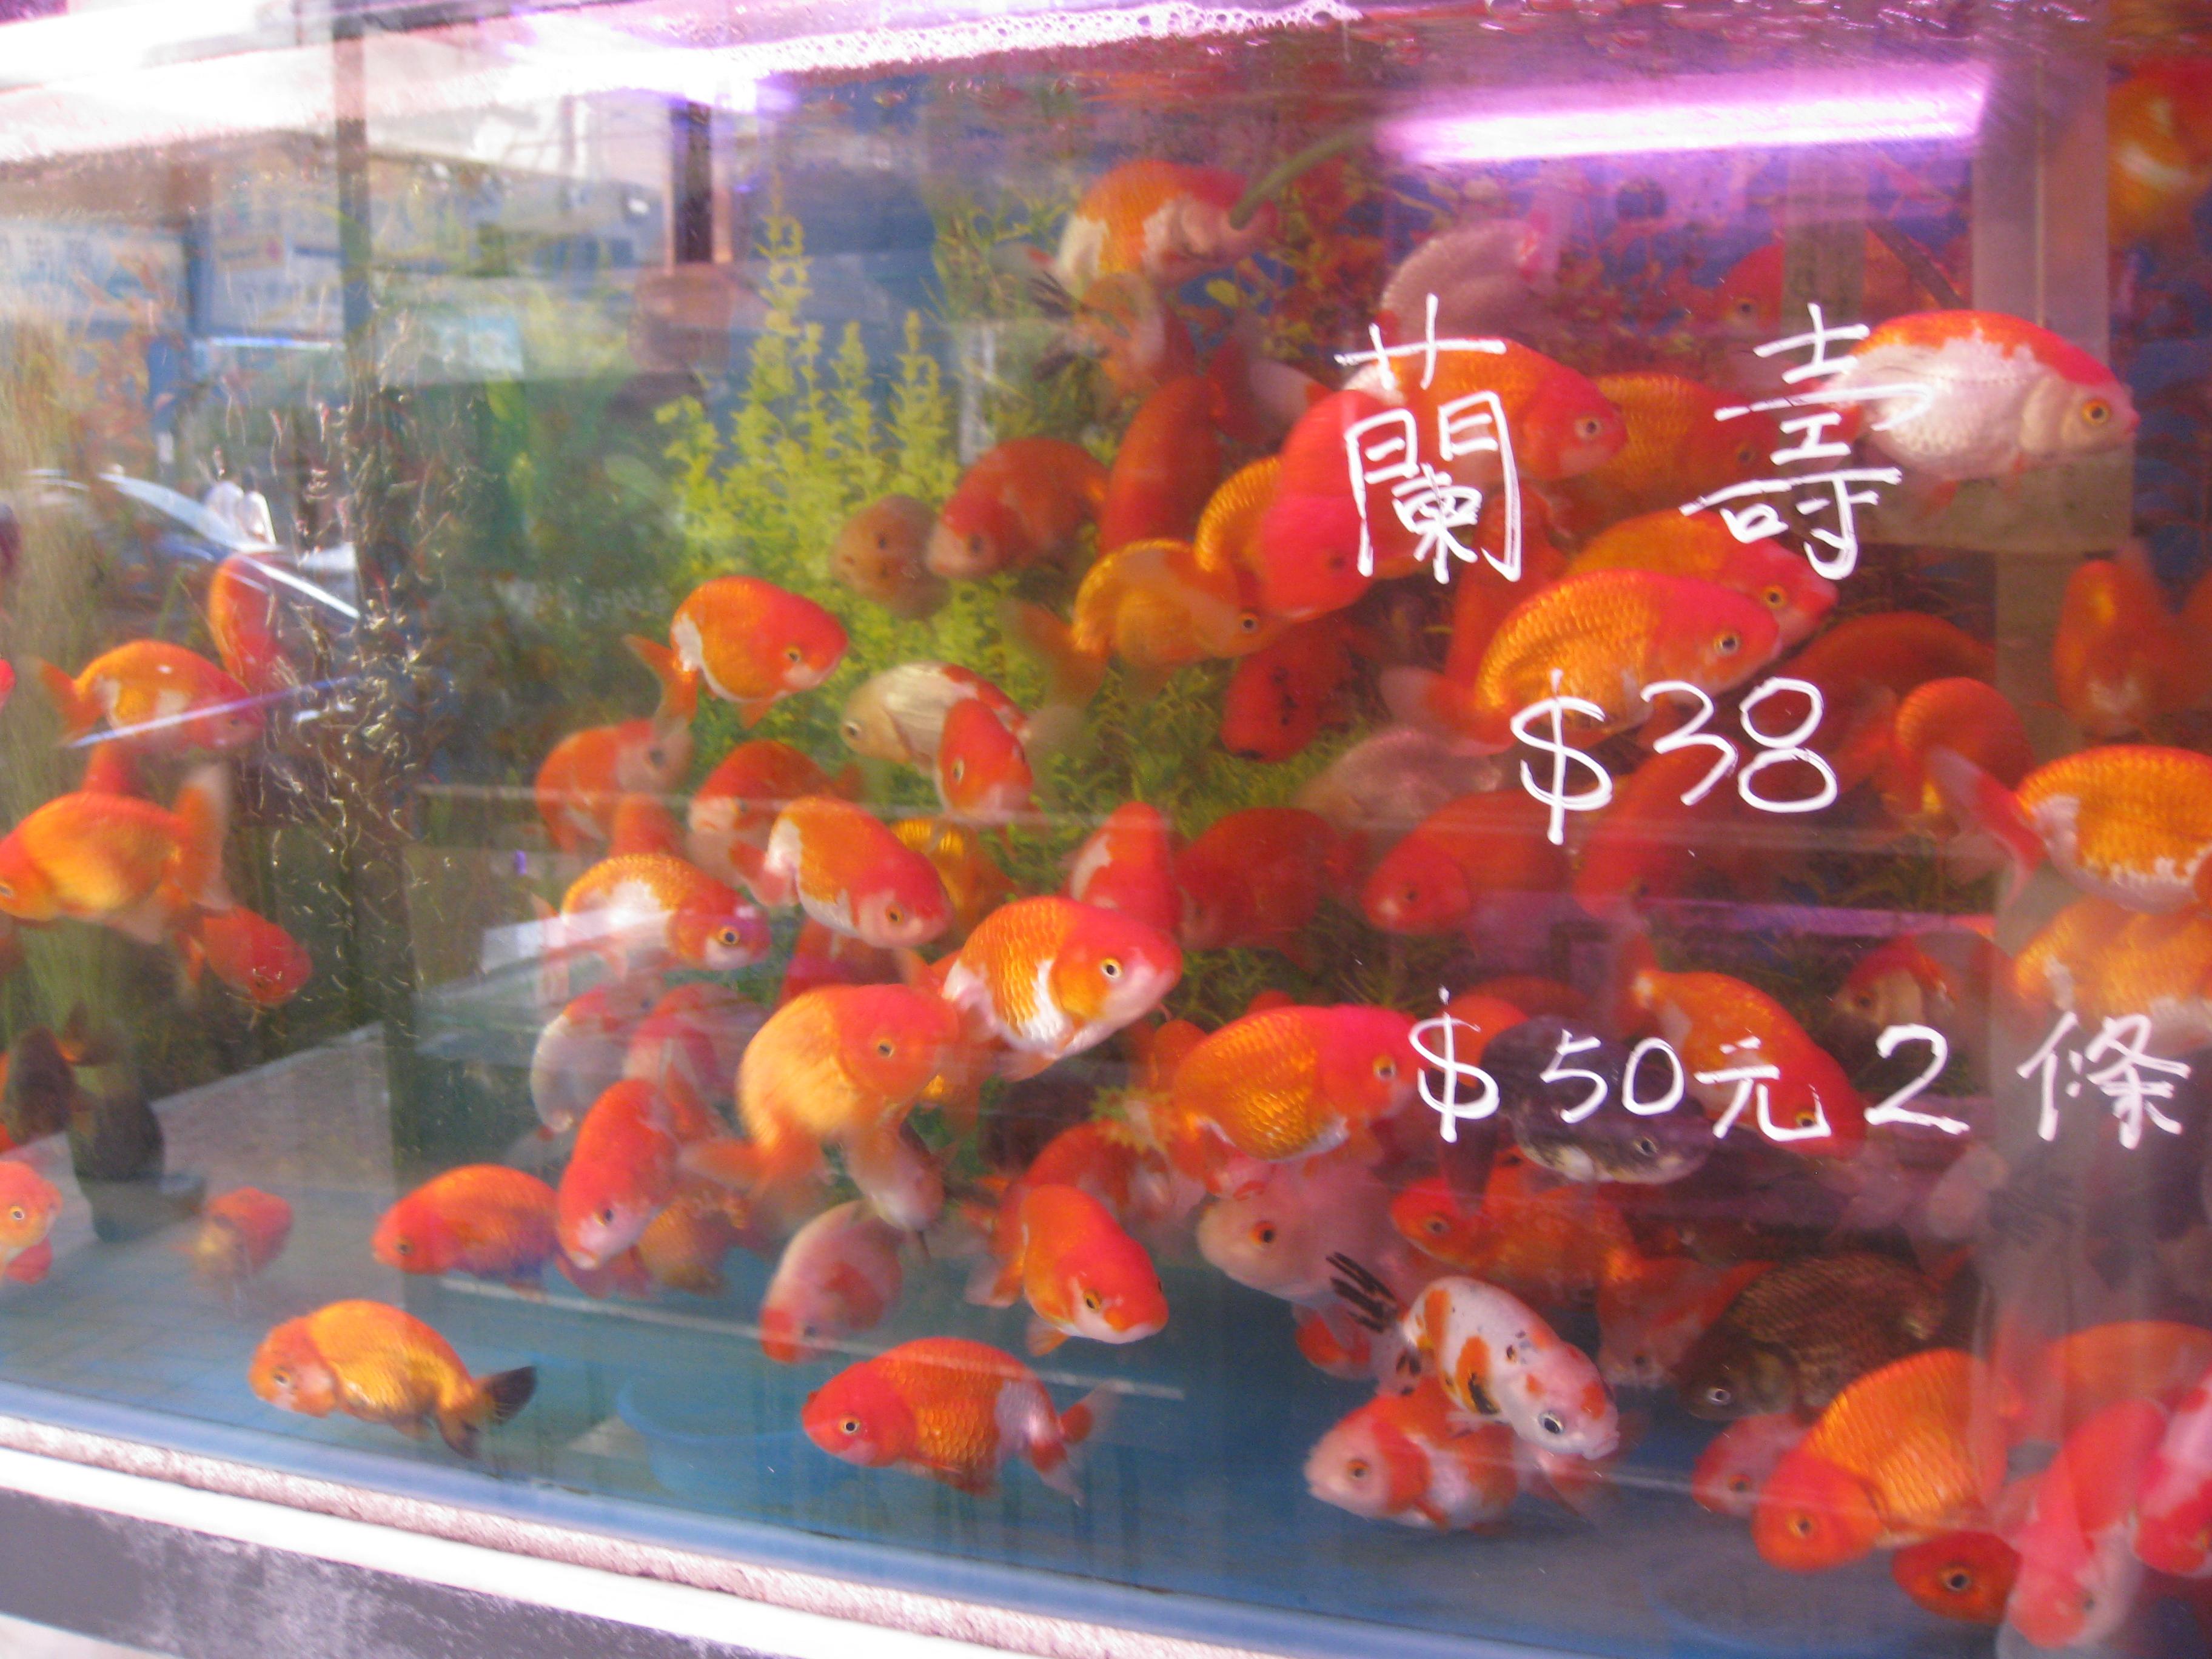 Fish for aquarium in kolkata - Pros And Cons Choosing Your Fish In The Goldfish Market My Aquarium Club